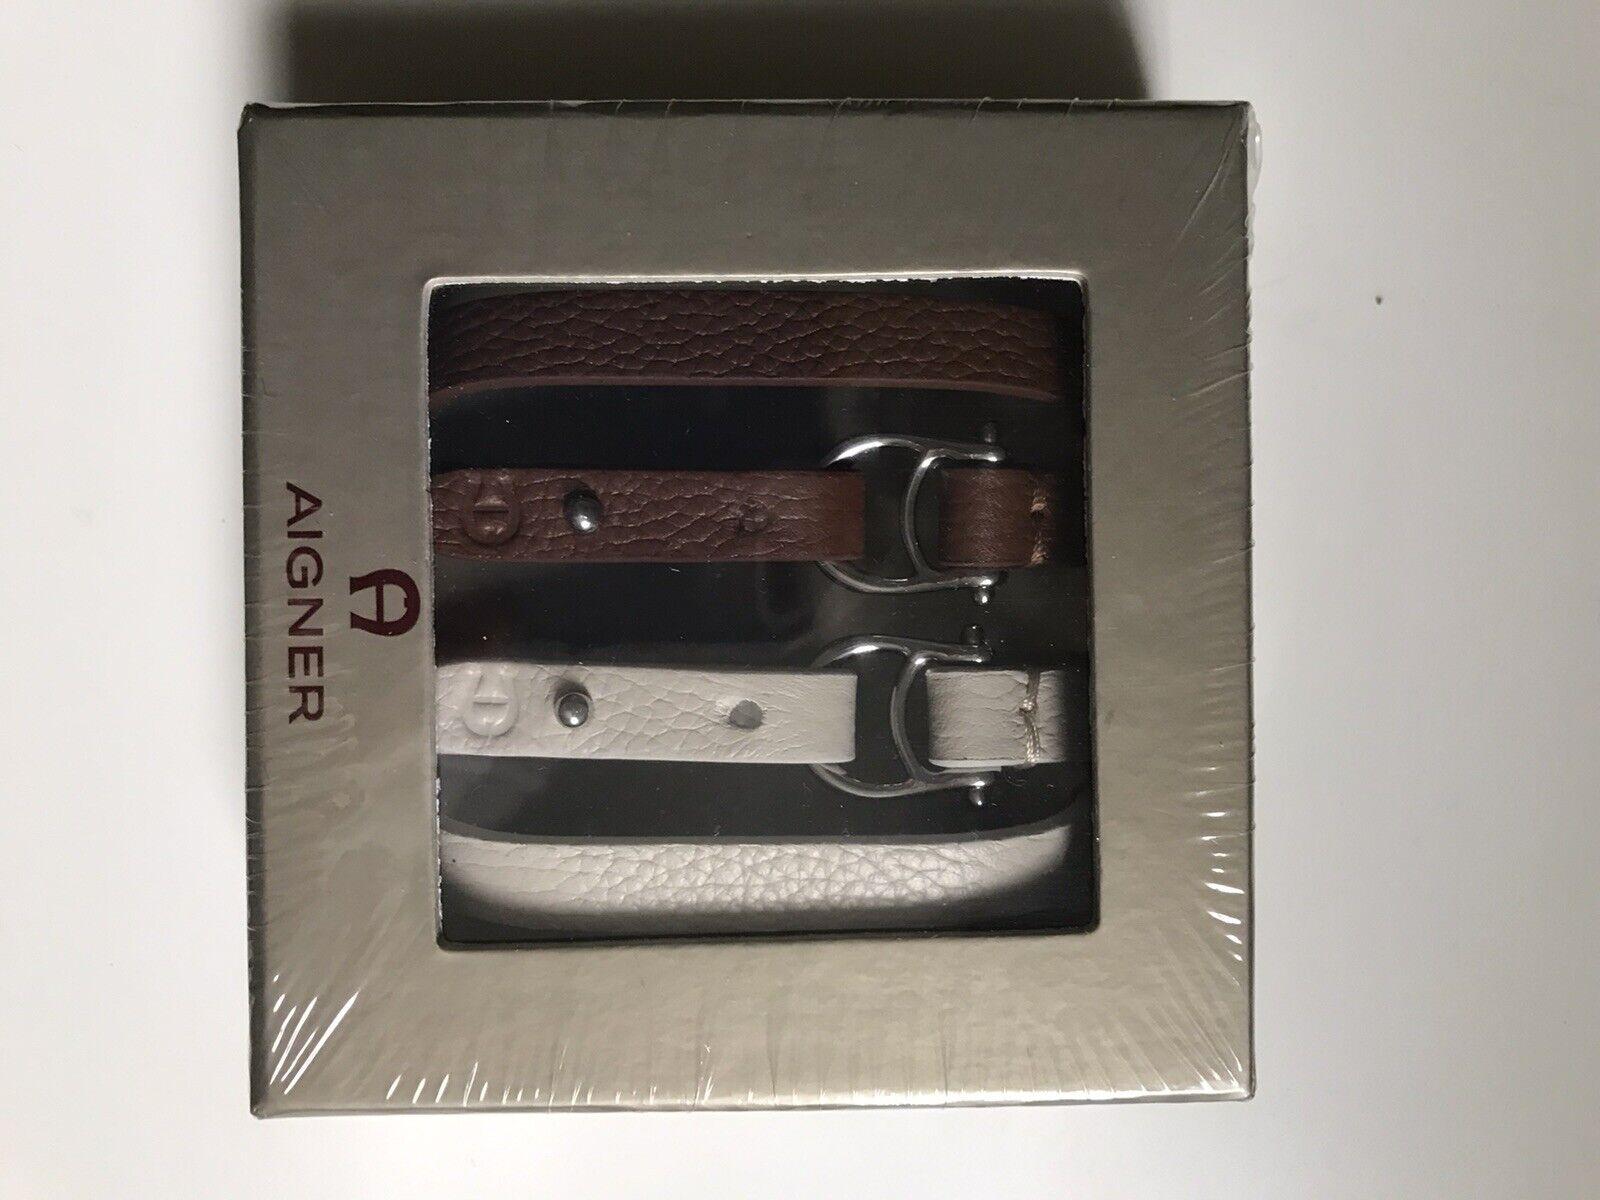 Aigner Leather Bracelets One Cream One Tan Brown, BNIB